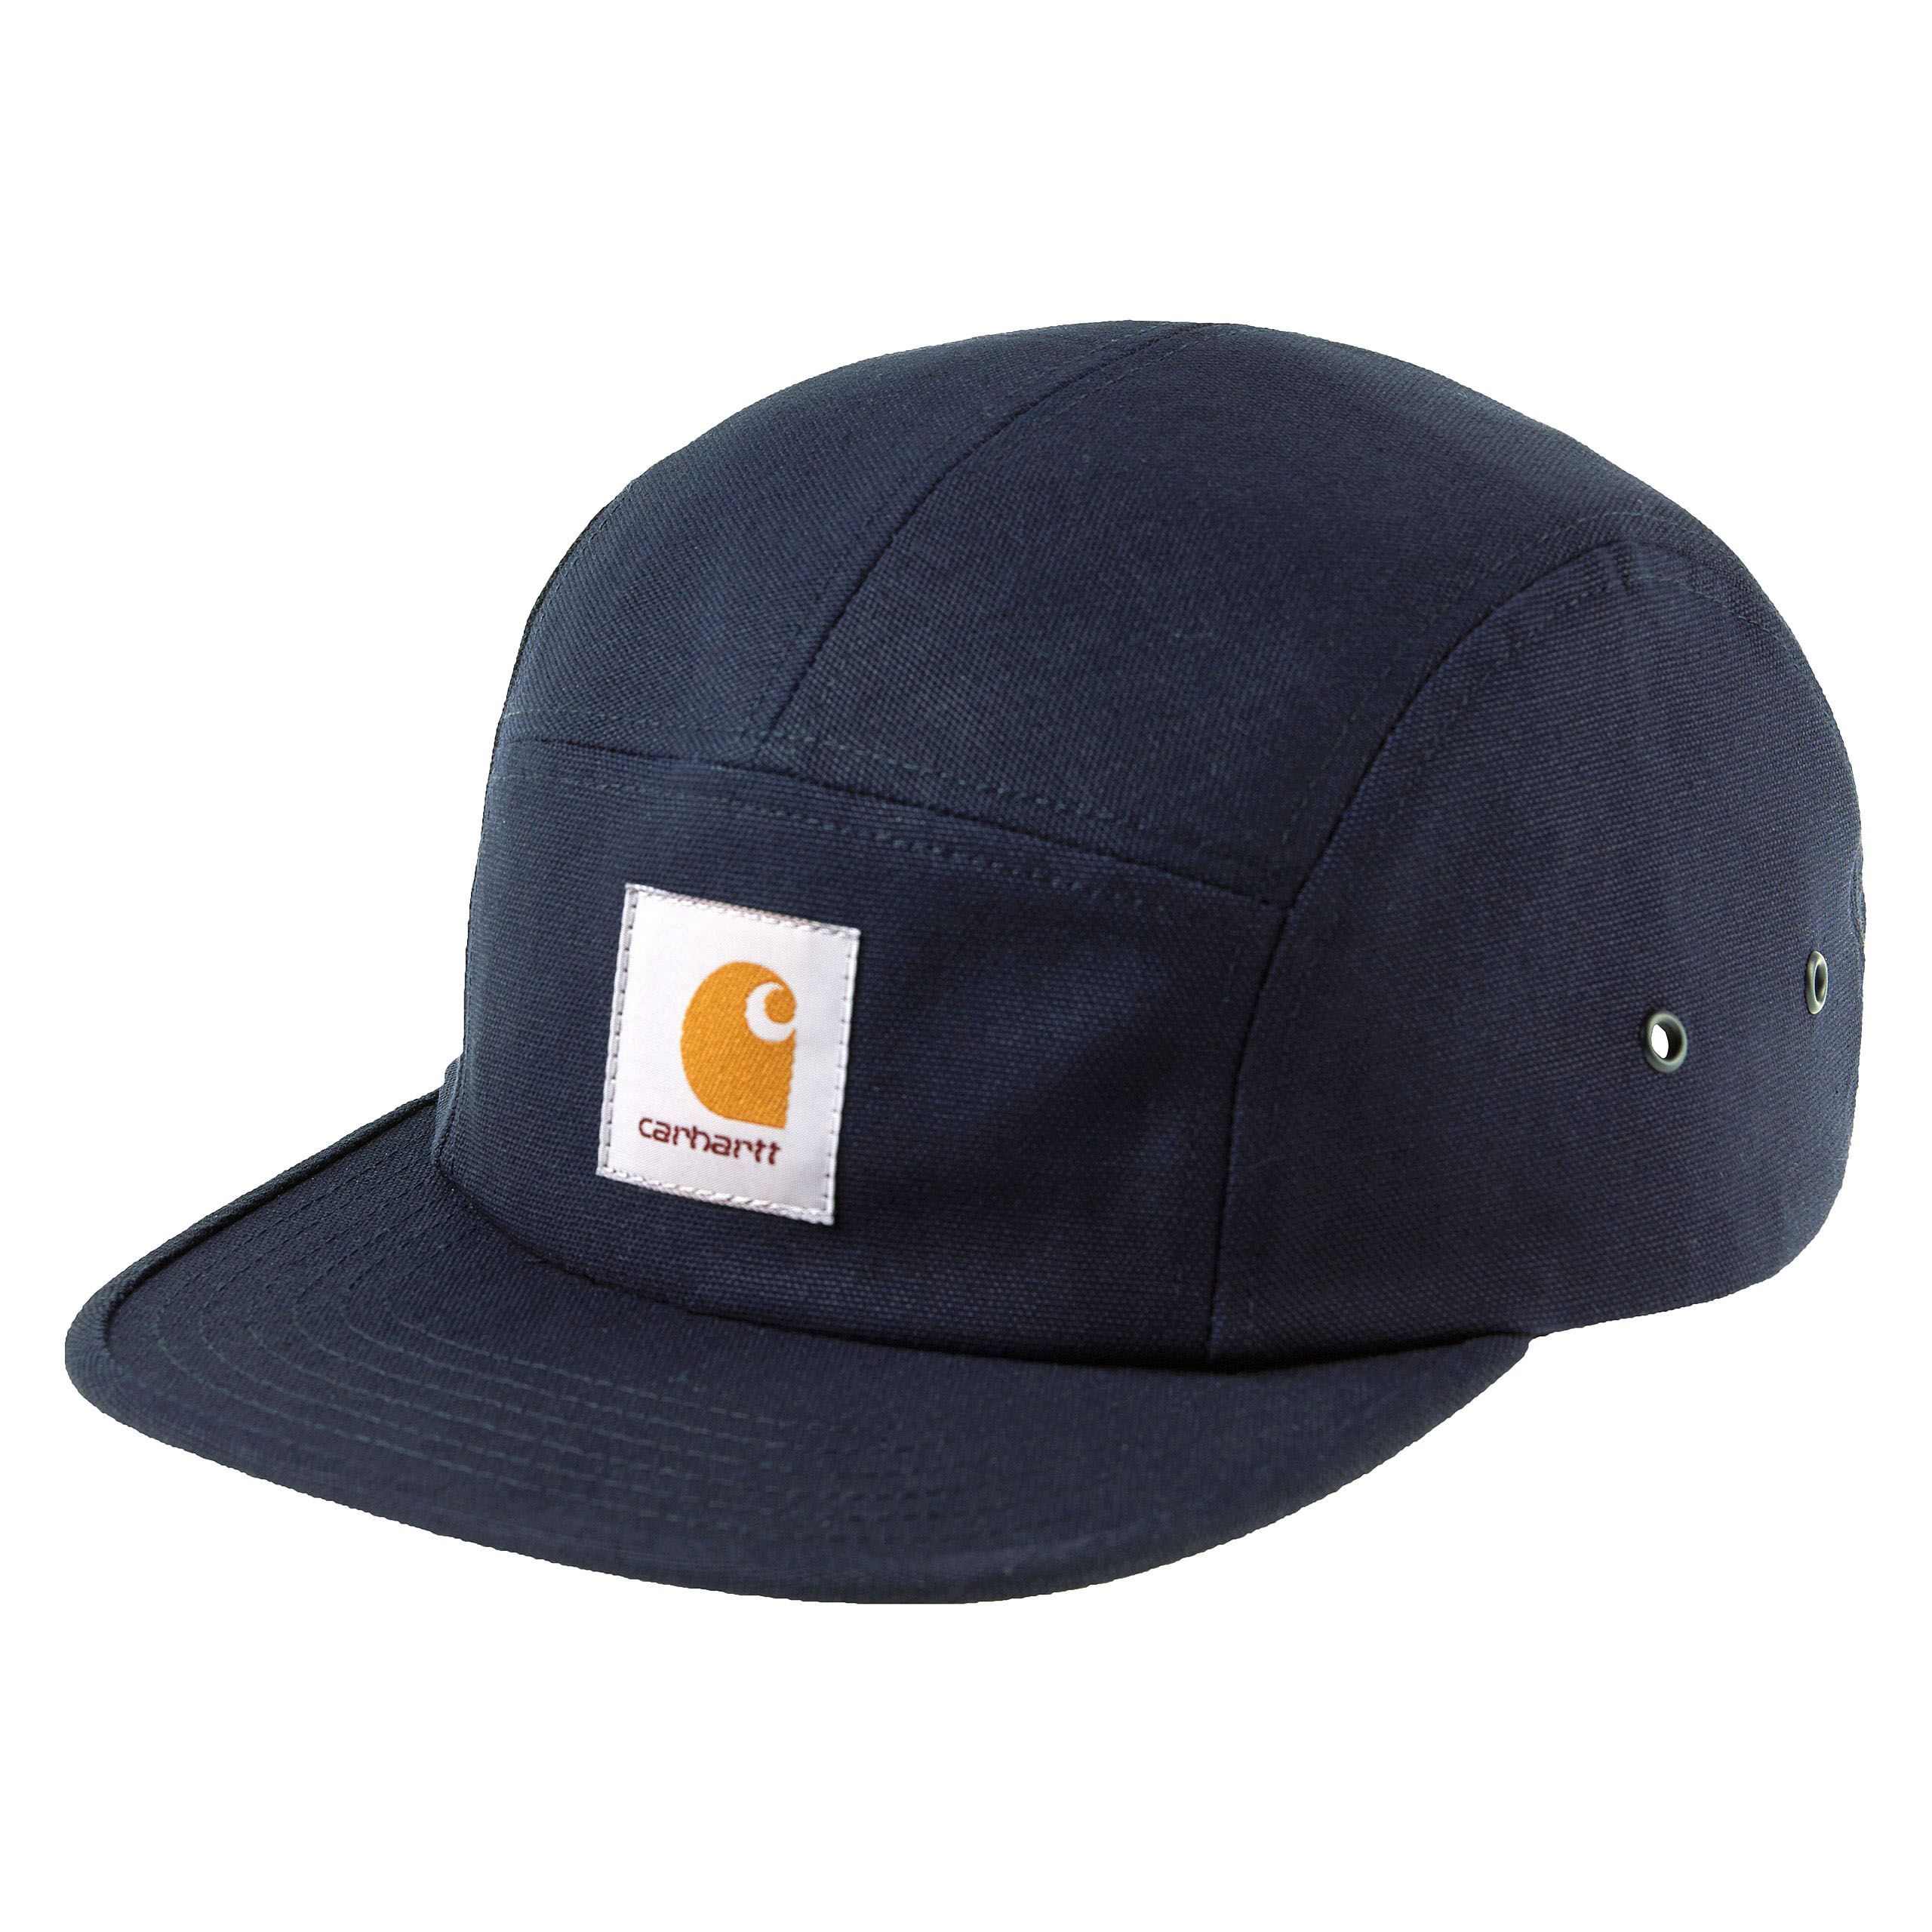 Carhartt WIP - BACKLEY CAP - Dark Navy